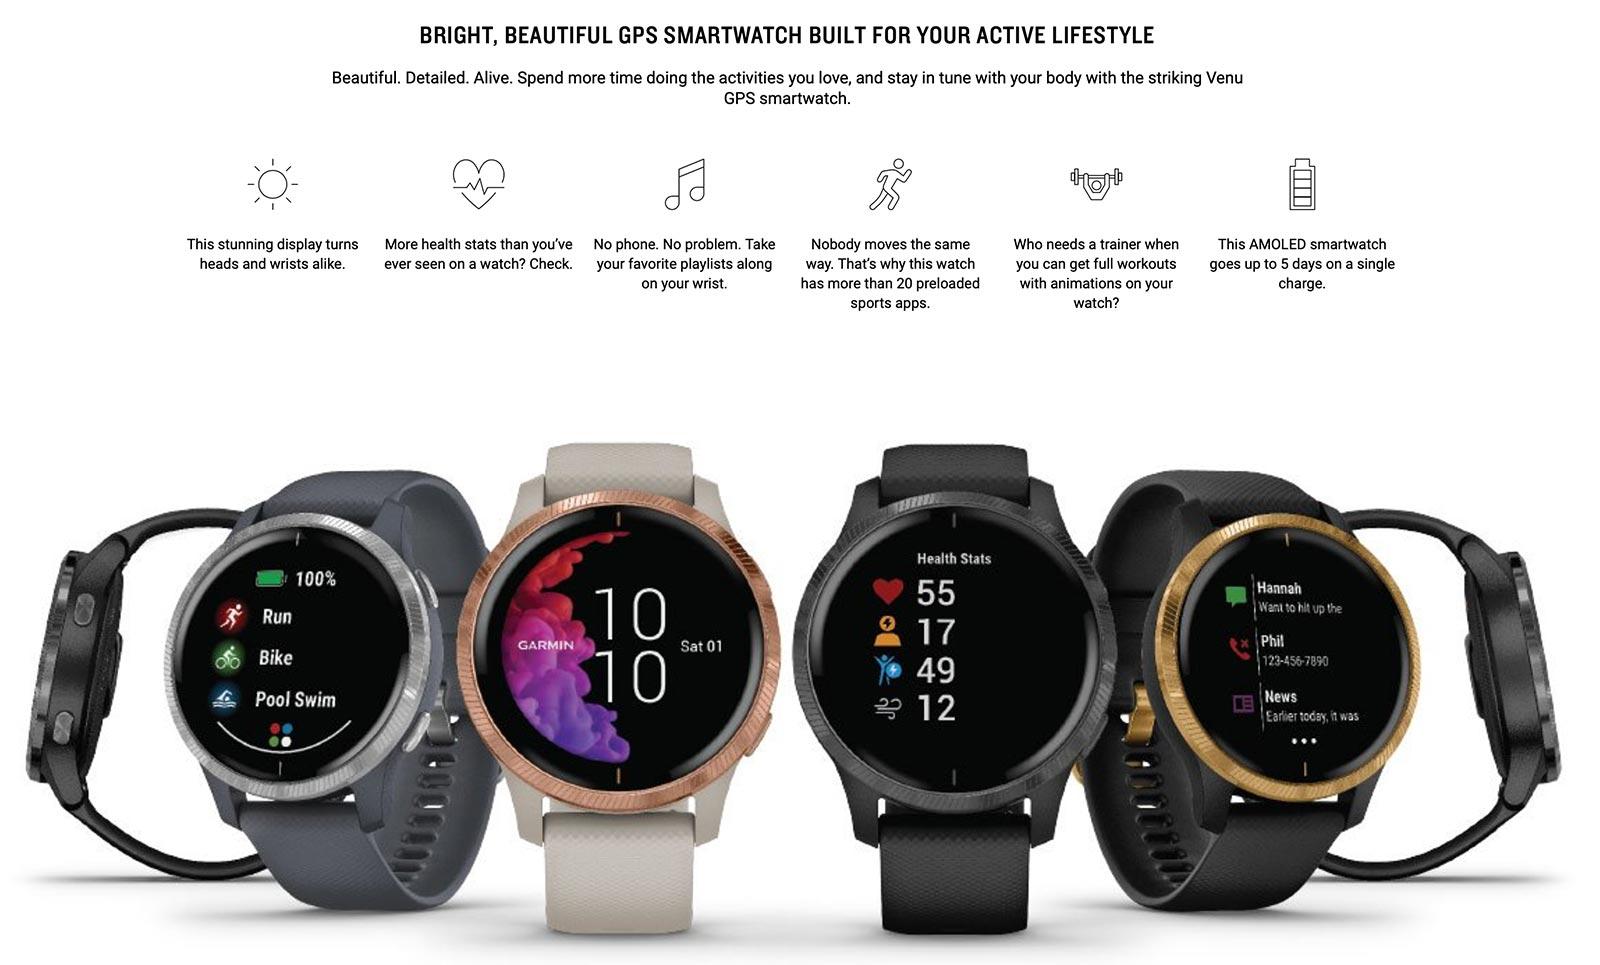 Garmin's basic page featuring the Venu watch